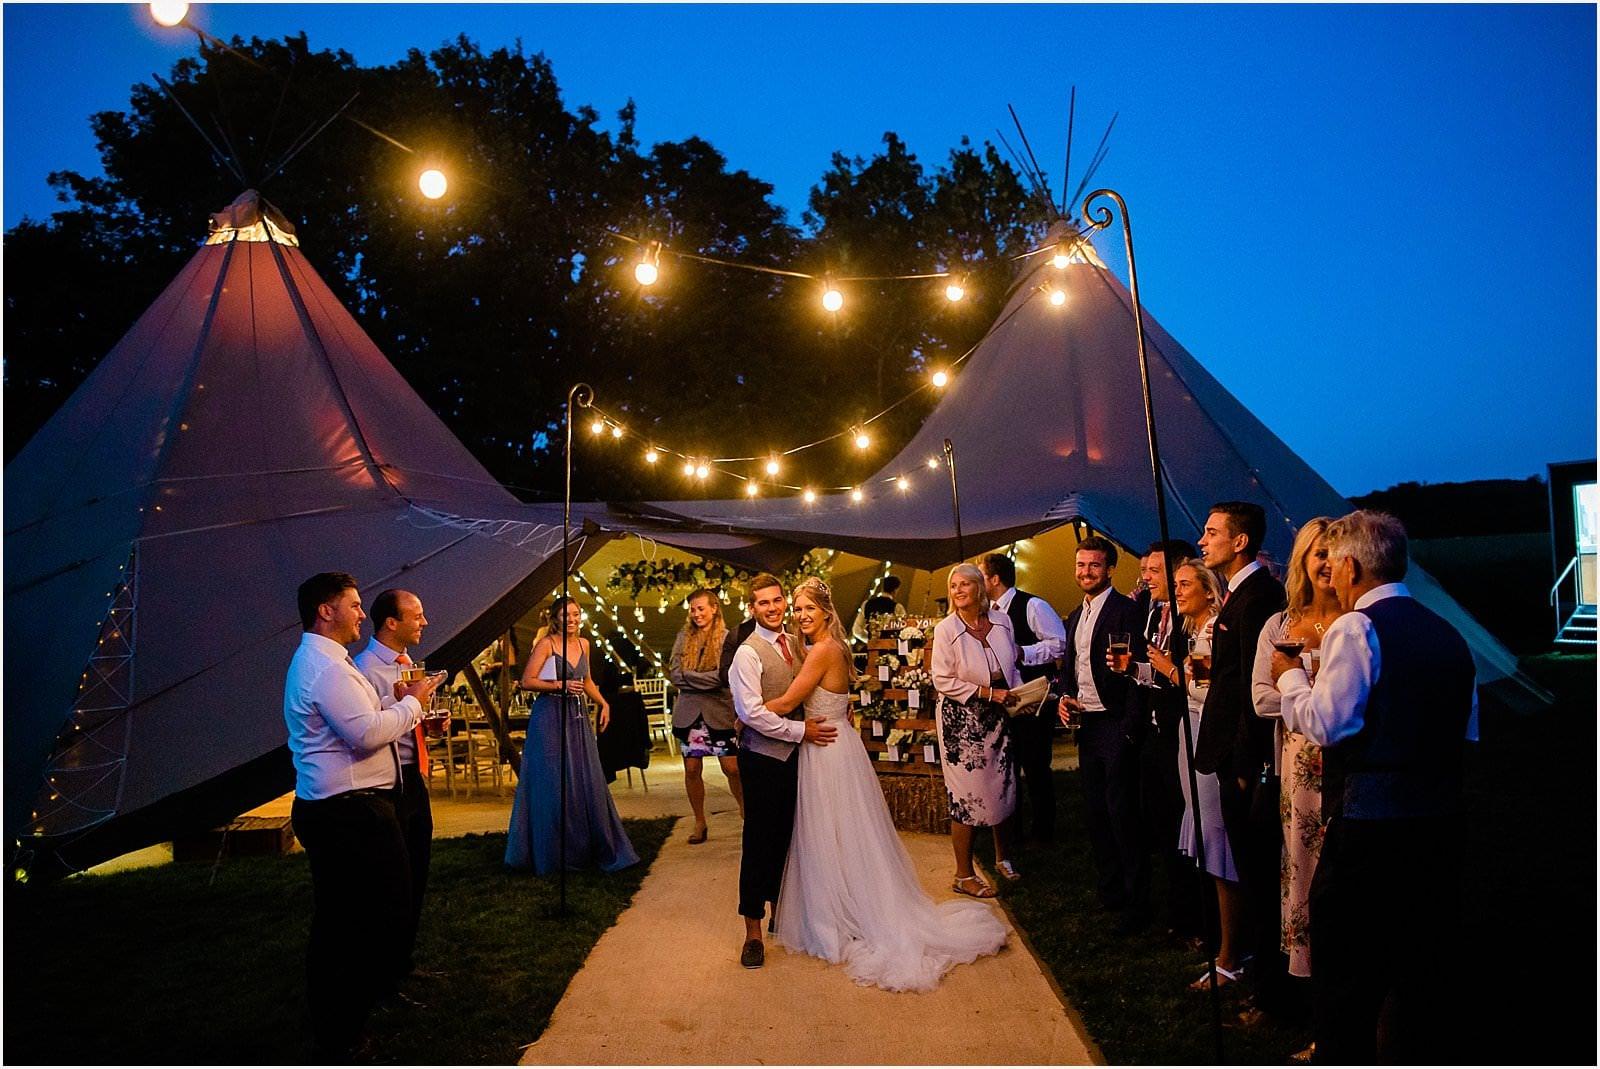 Fascinating! In the bride's words - Annie & Tim's wedding 4